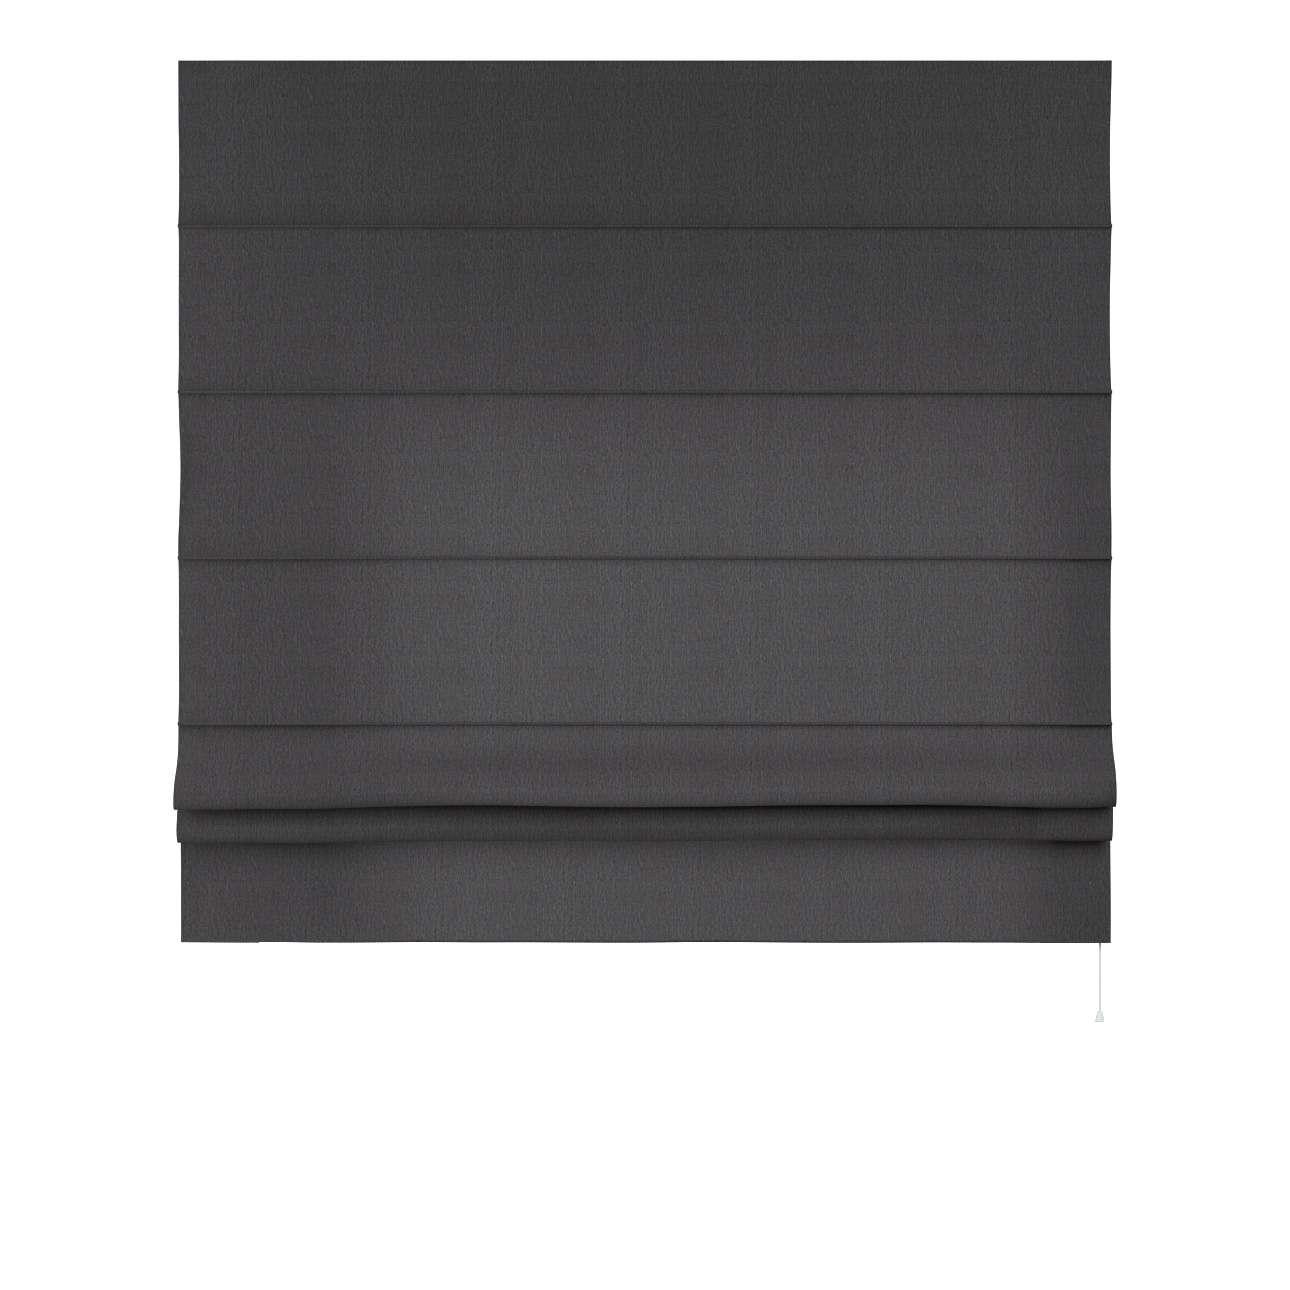 Romanetės Padva 130 x 170 cm (plotis x ilgis) kolekcijoje Chenille, audinys: 702-20